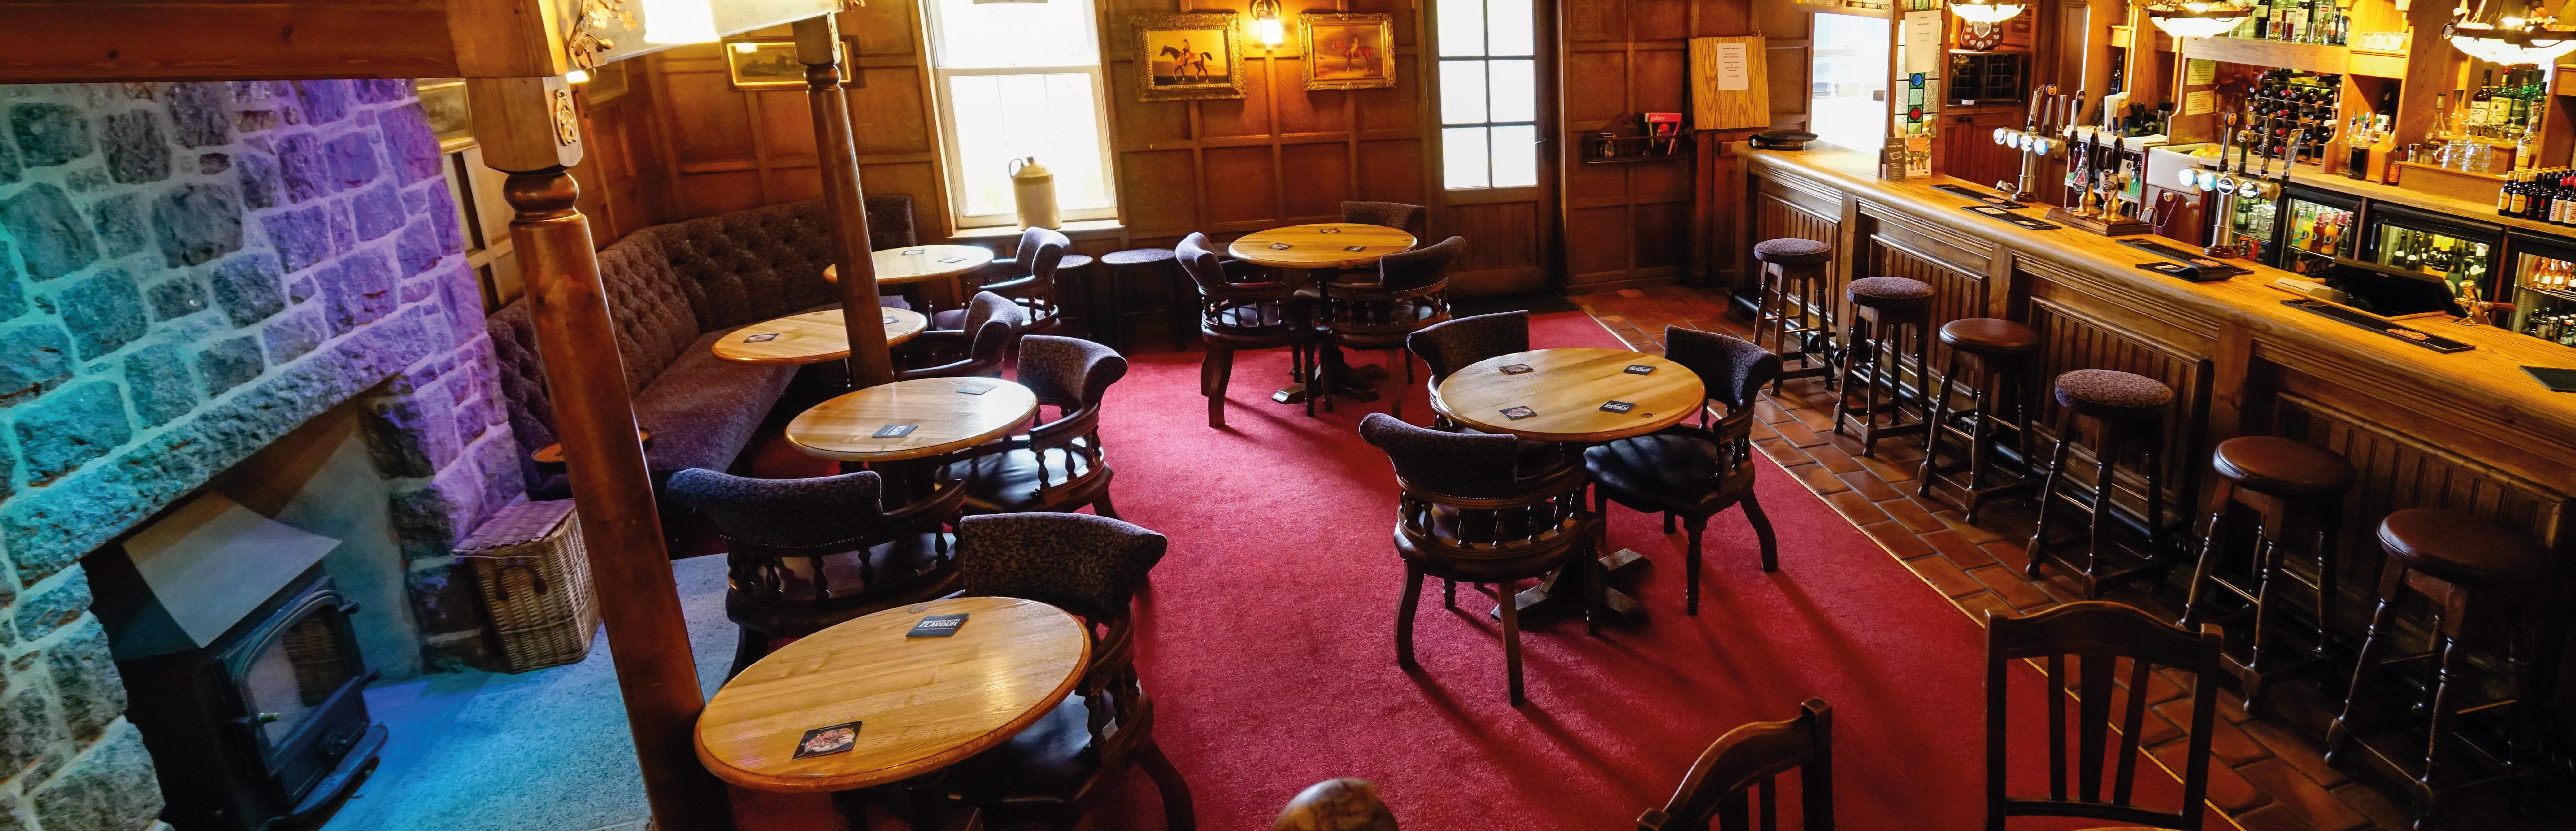 Randalls The Royal St Martin Pub and Restaurant